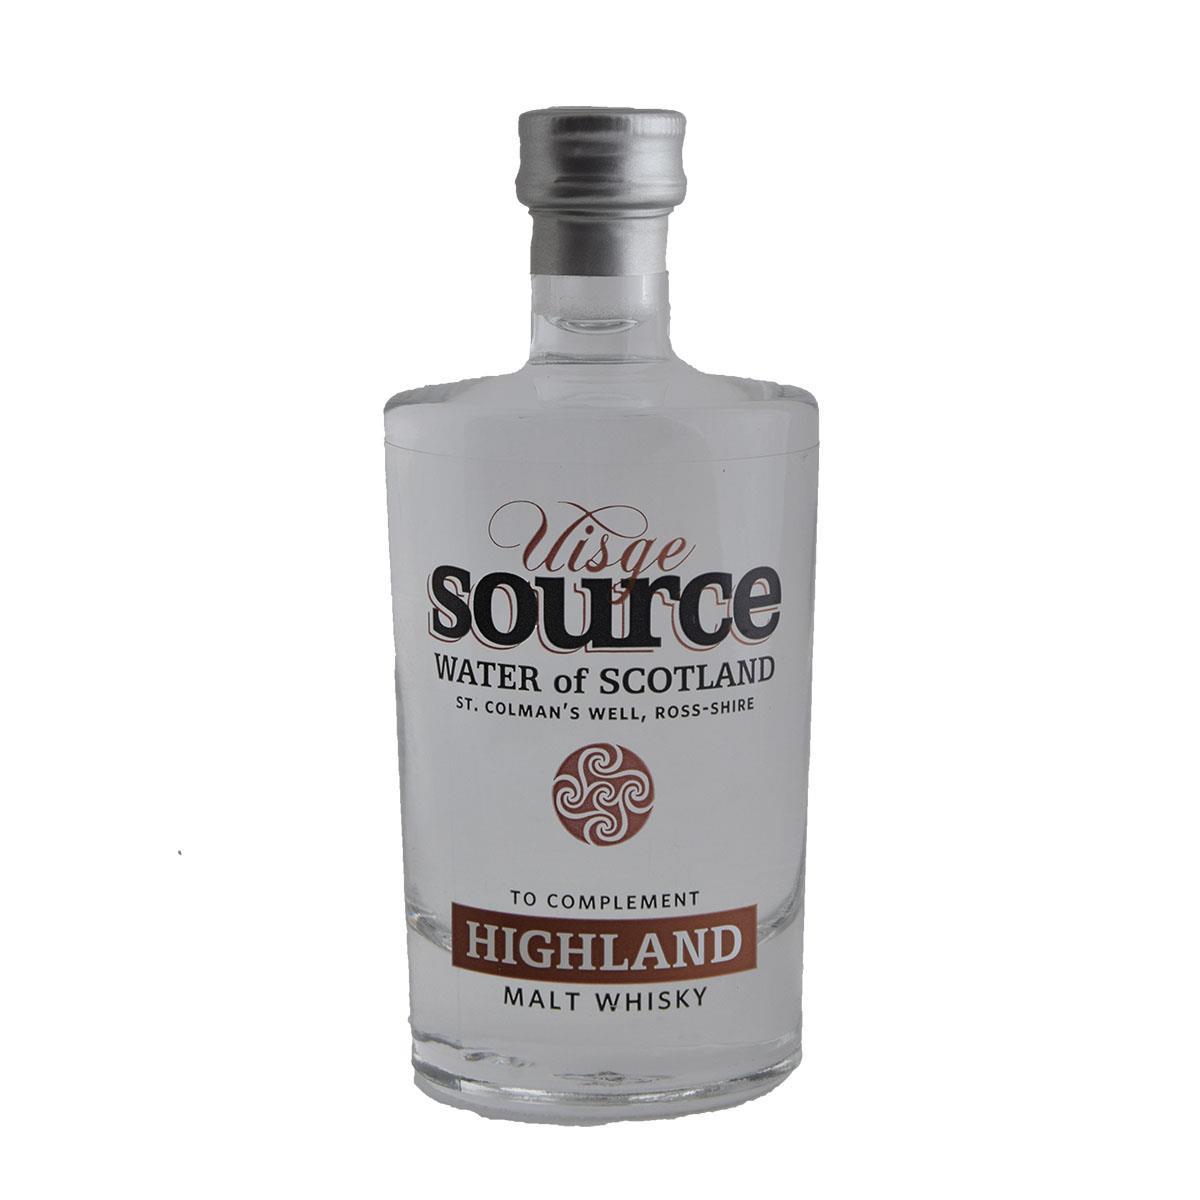 Uisge Source Highland Νερό Σκωτίας 100ml